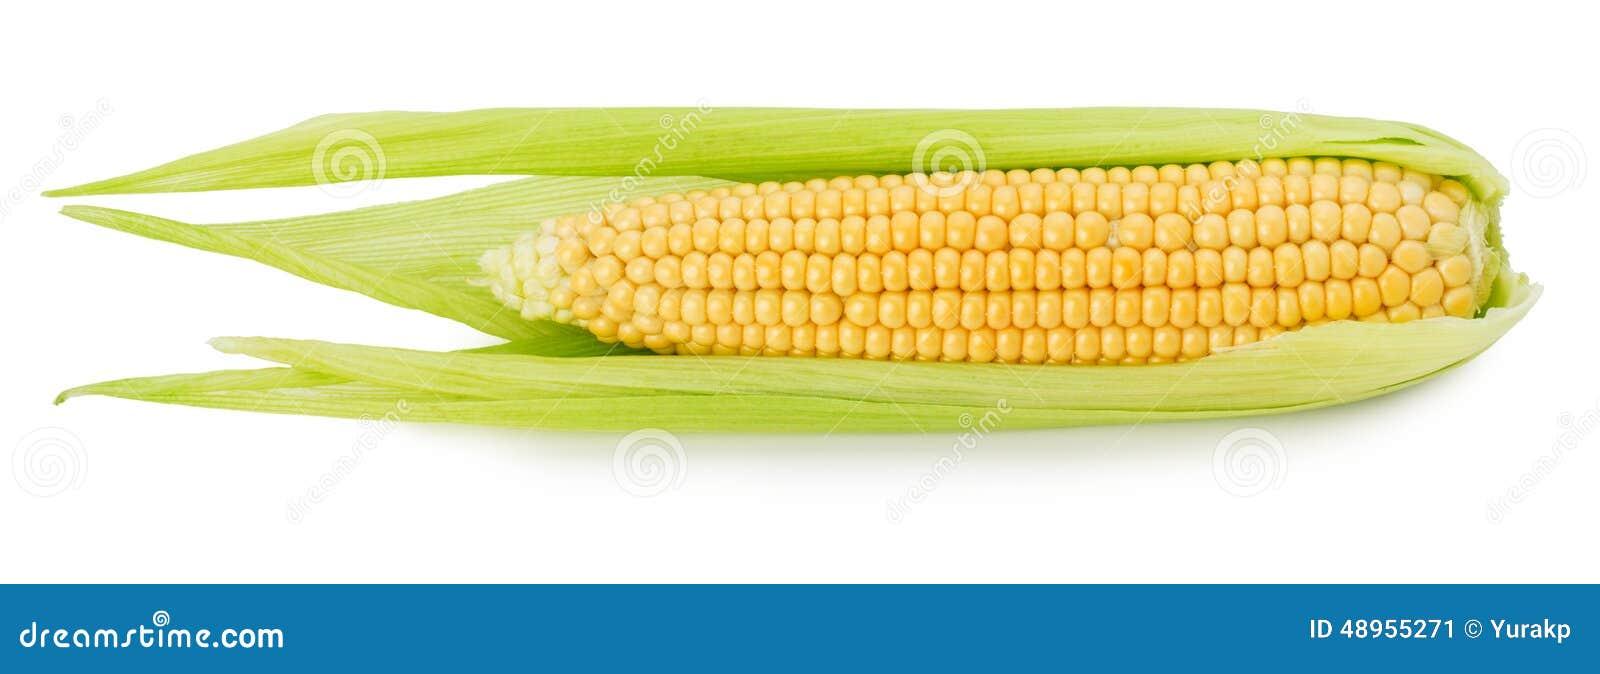 Orelha de milho fresca isolada no fundo branco